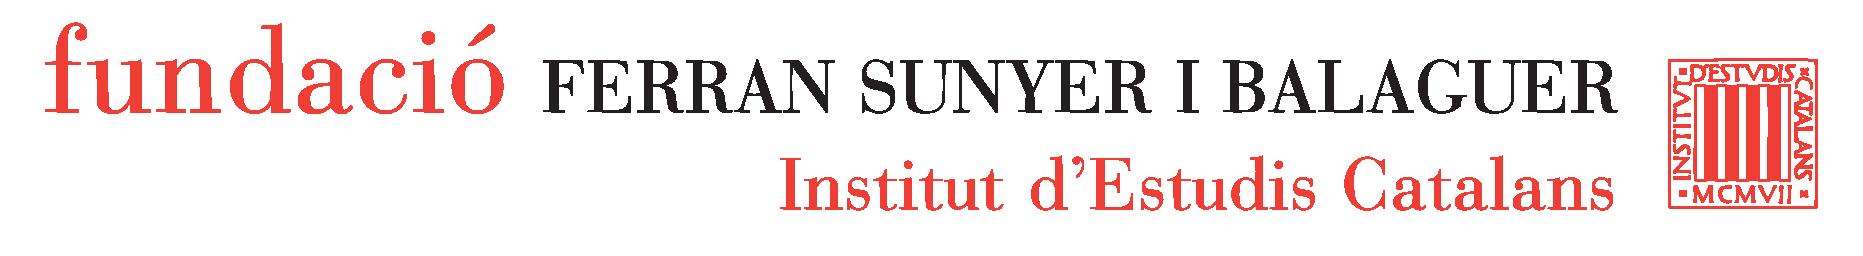 Fundació Ferran Sunyer i Balaguer